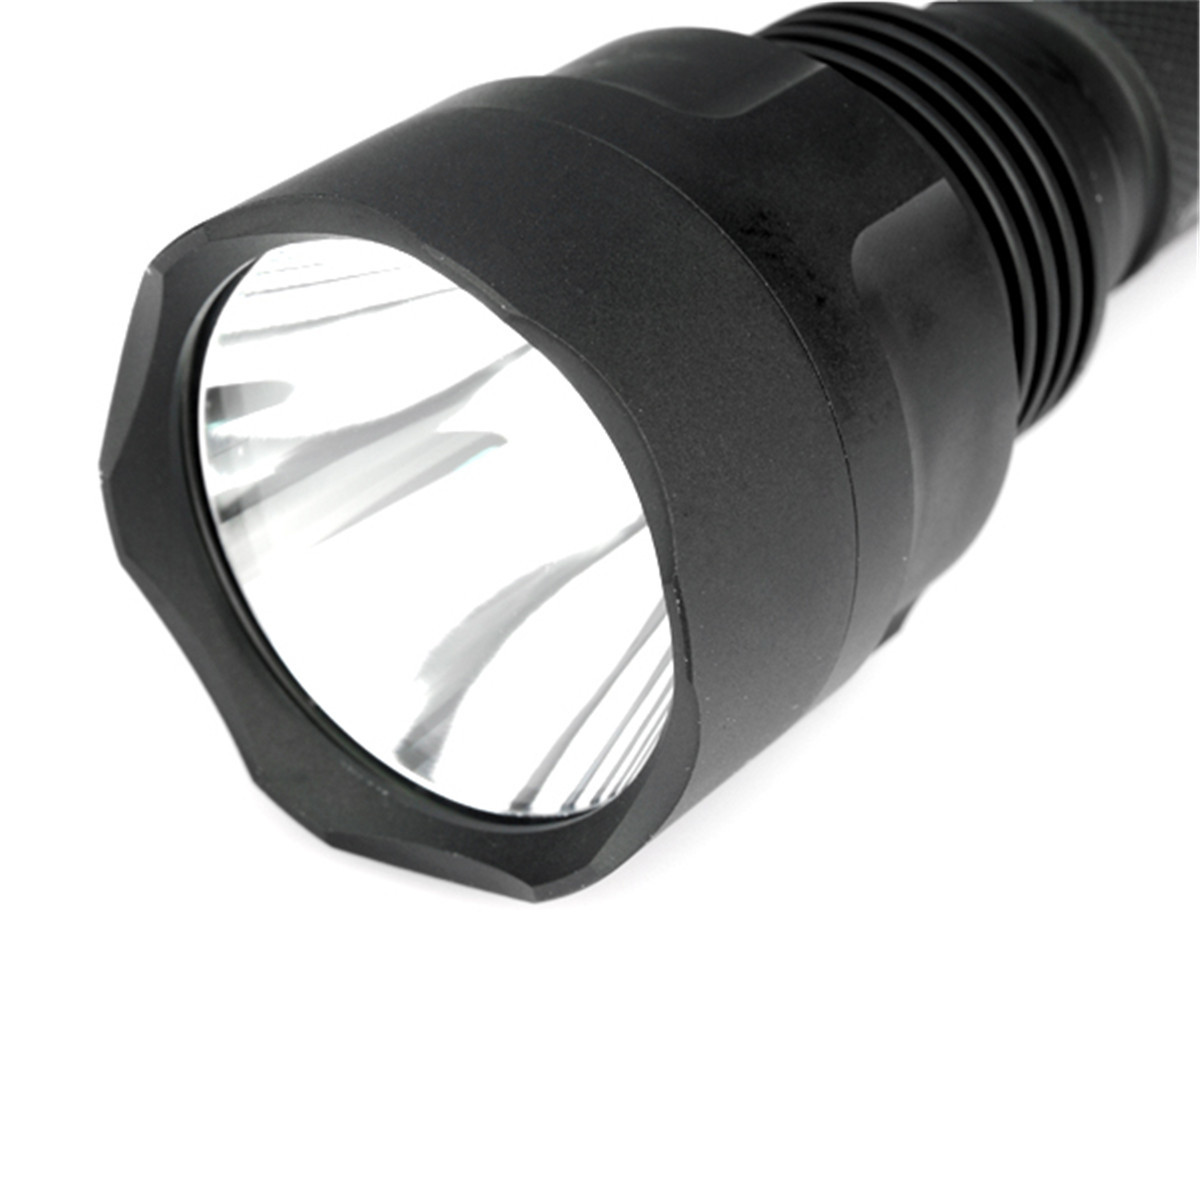 Convoy C8 NEW Version Aluminum Alloy DIY LED Flashlight Shell Host with SMO Reflector, Glass Lens